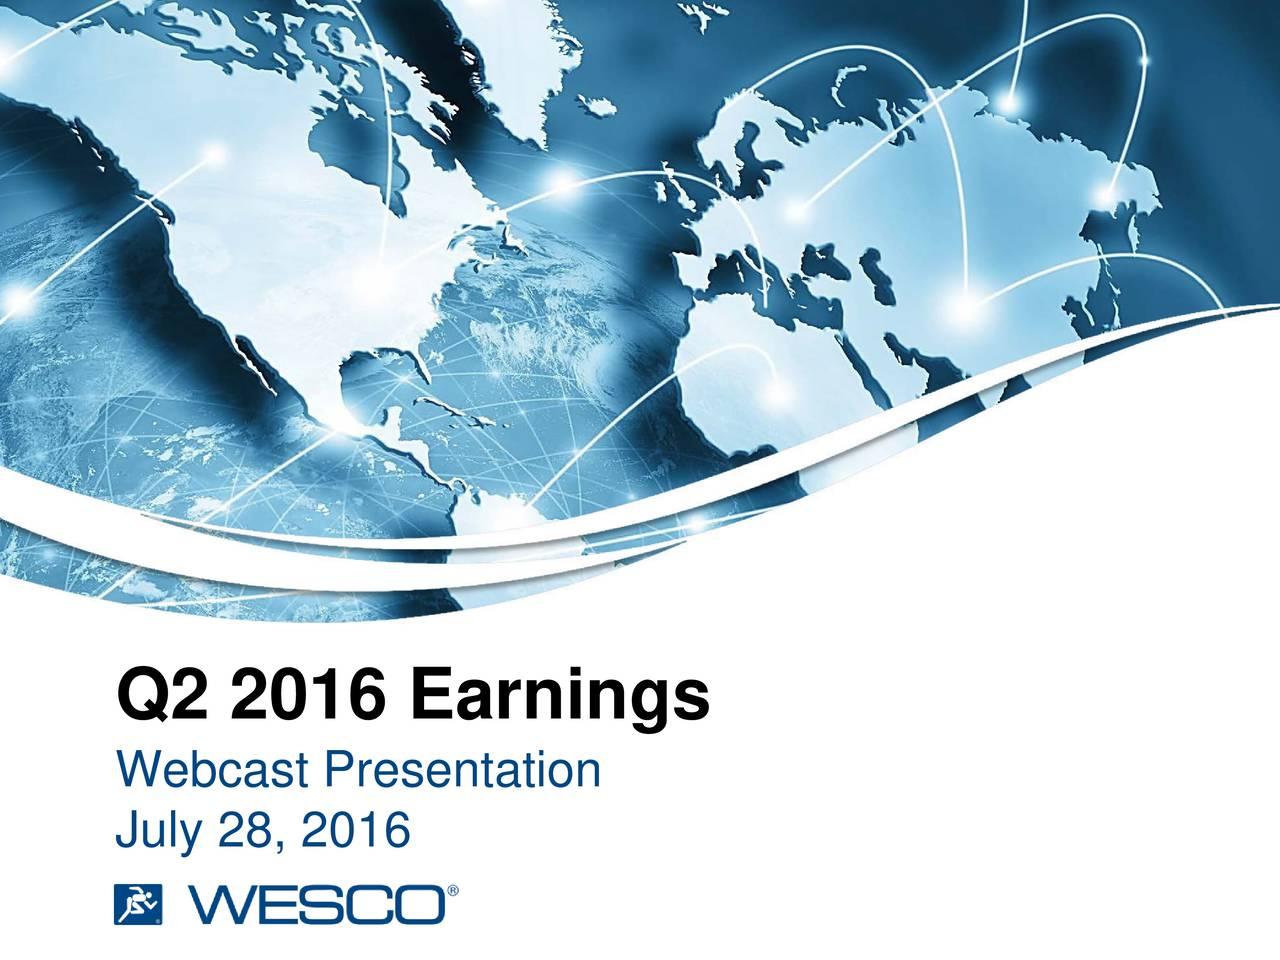 Webcast Presentation July 28, 2016